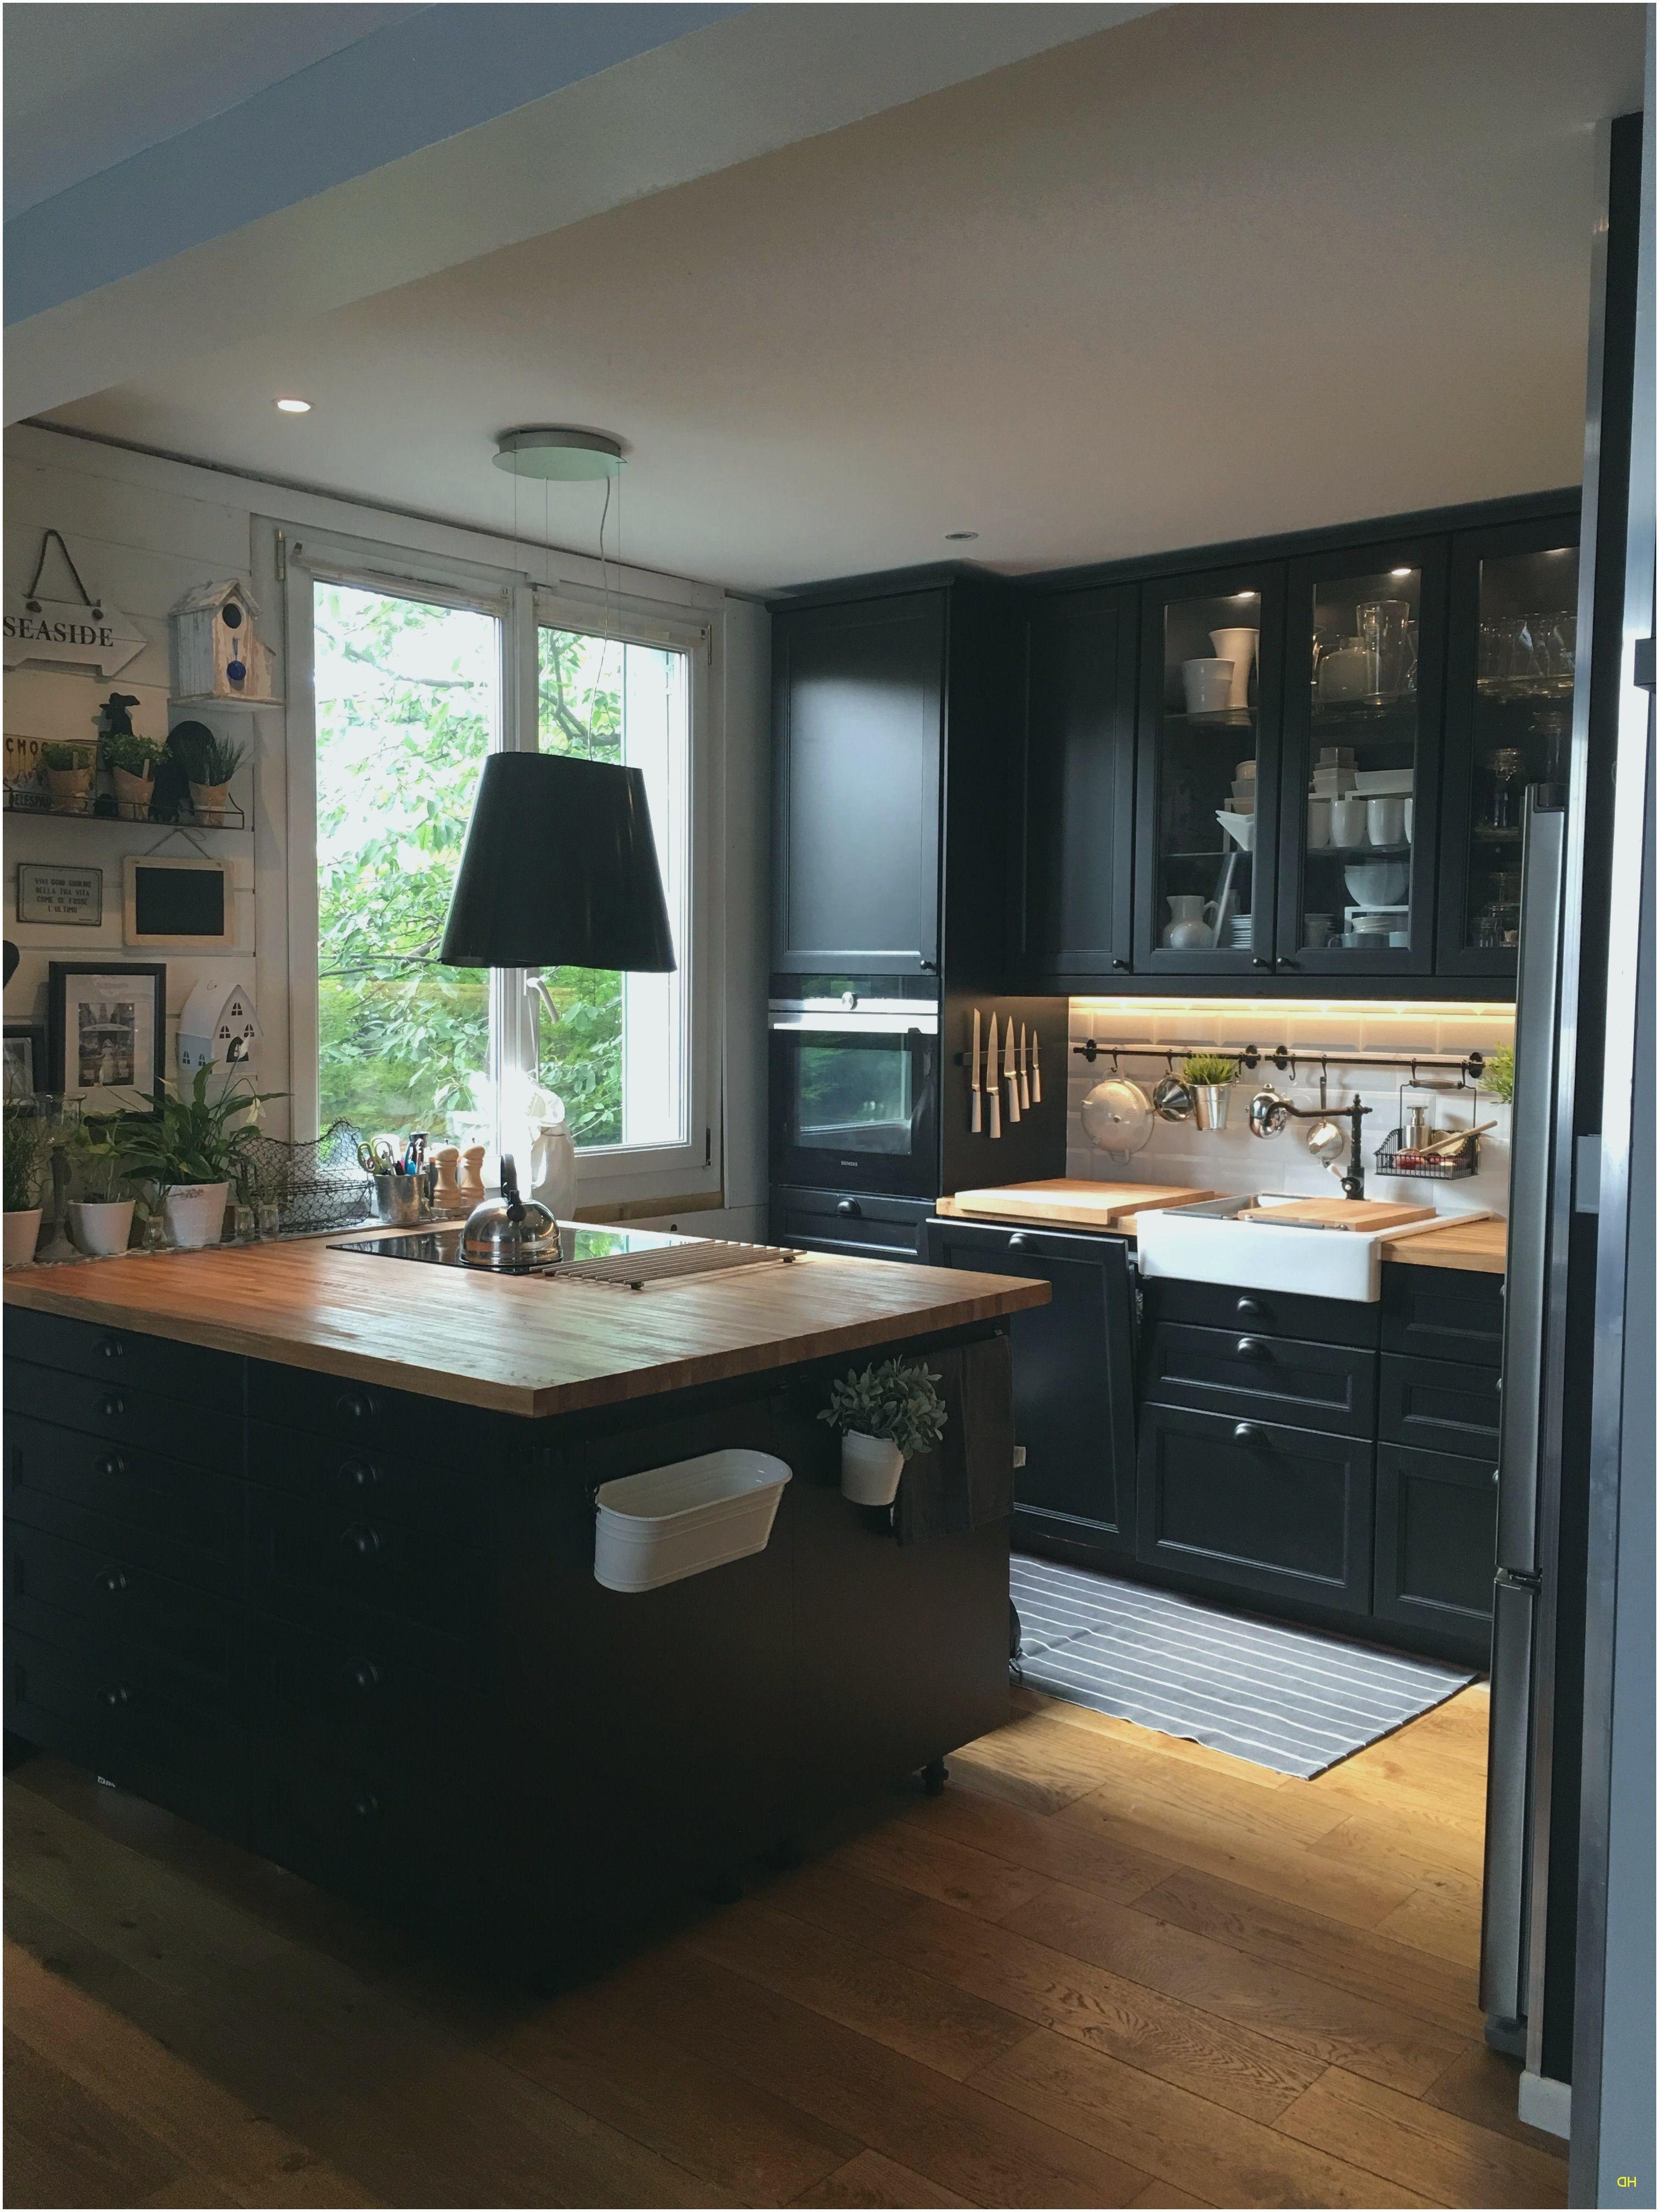 35 Impressionnant Le Bon Coin Moselle Meubles Suggestions Ide Dapur Dekorasi Rumah Rumah